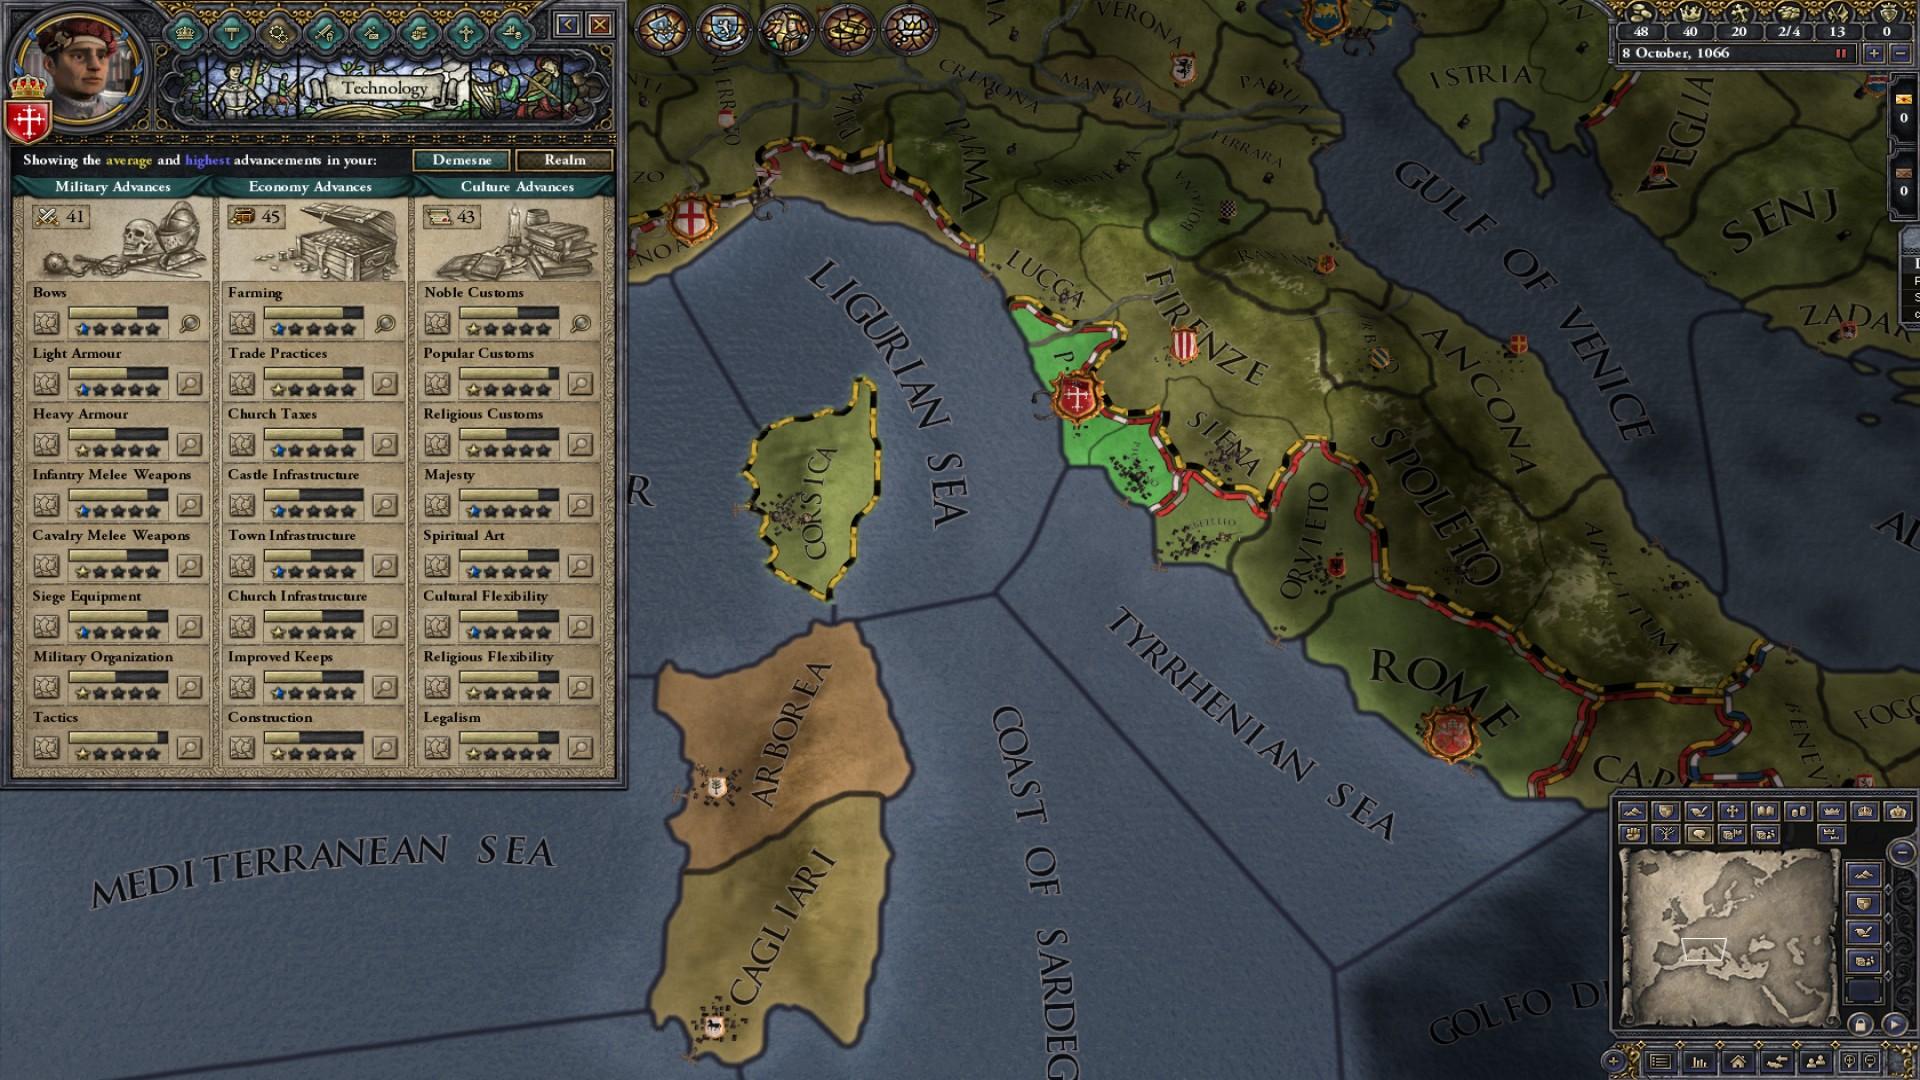 Expansion - Crusader Kings II: The Republic screenshot